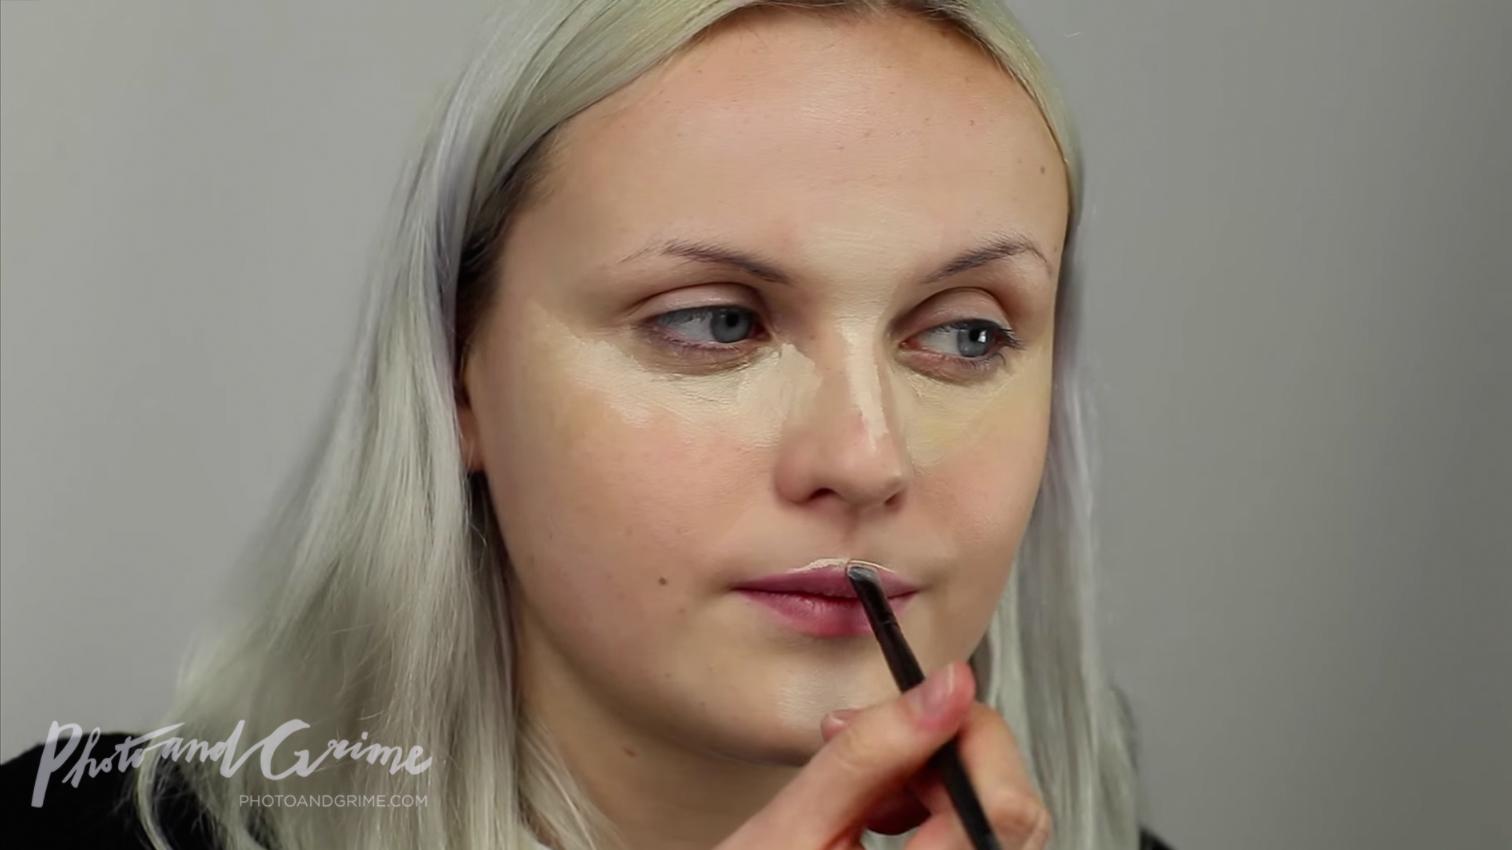 artistic fashion makeup tutorial PUNCHINGPICTURES Marly van den Bosch 01.jpg